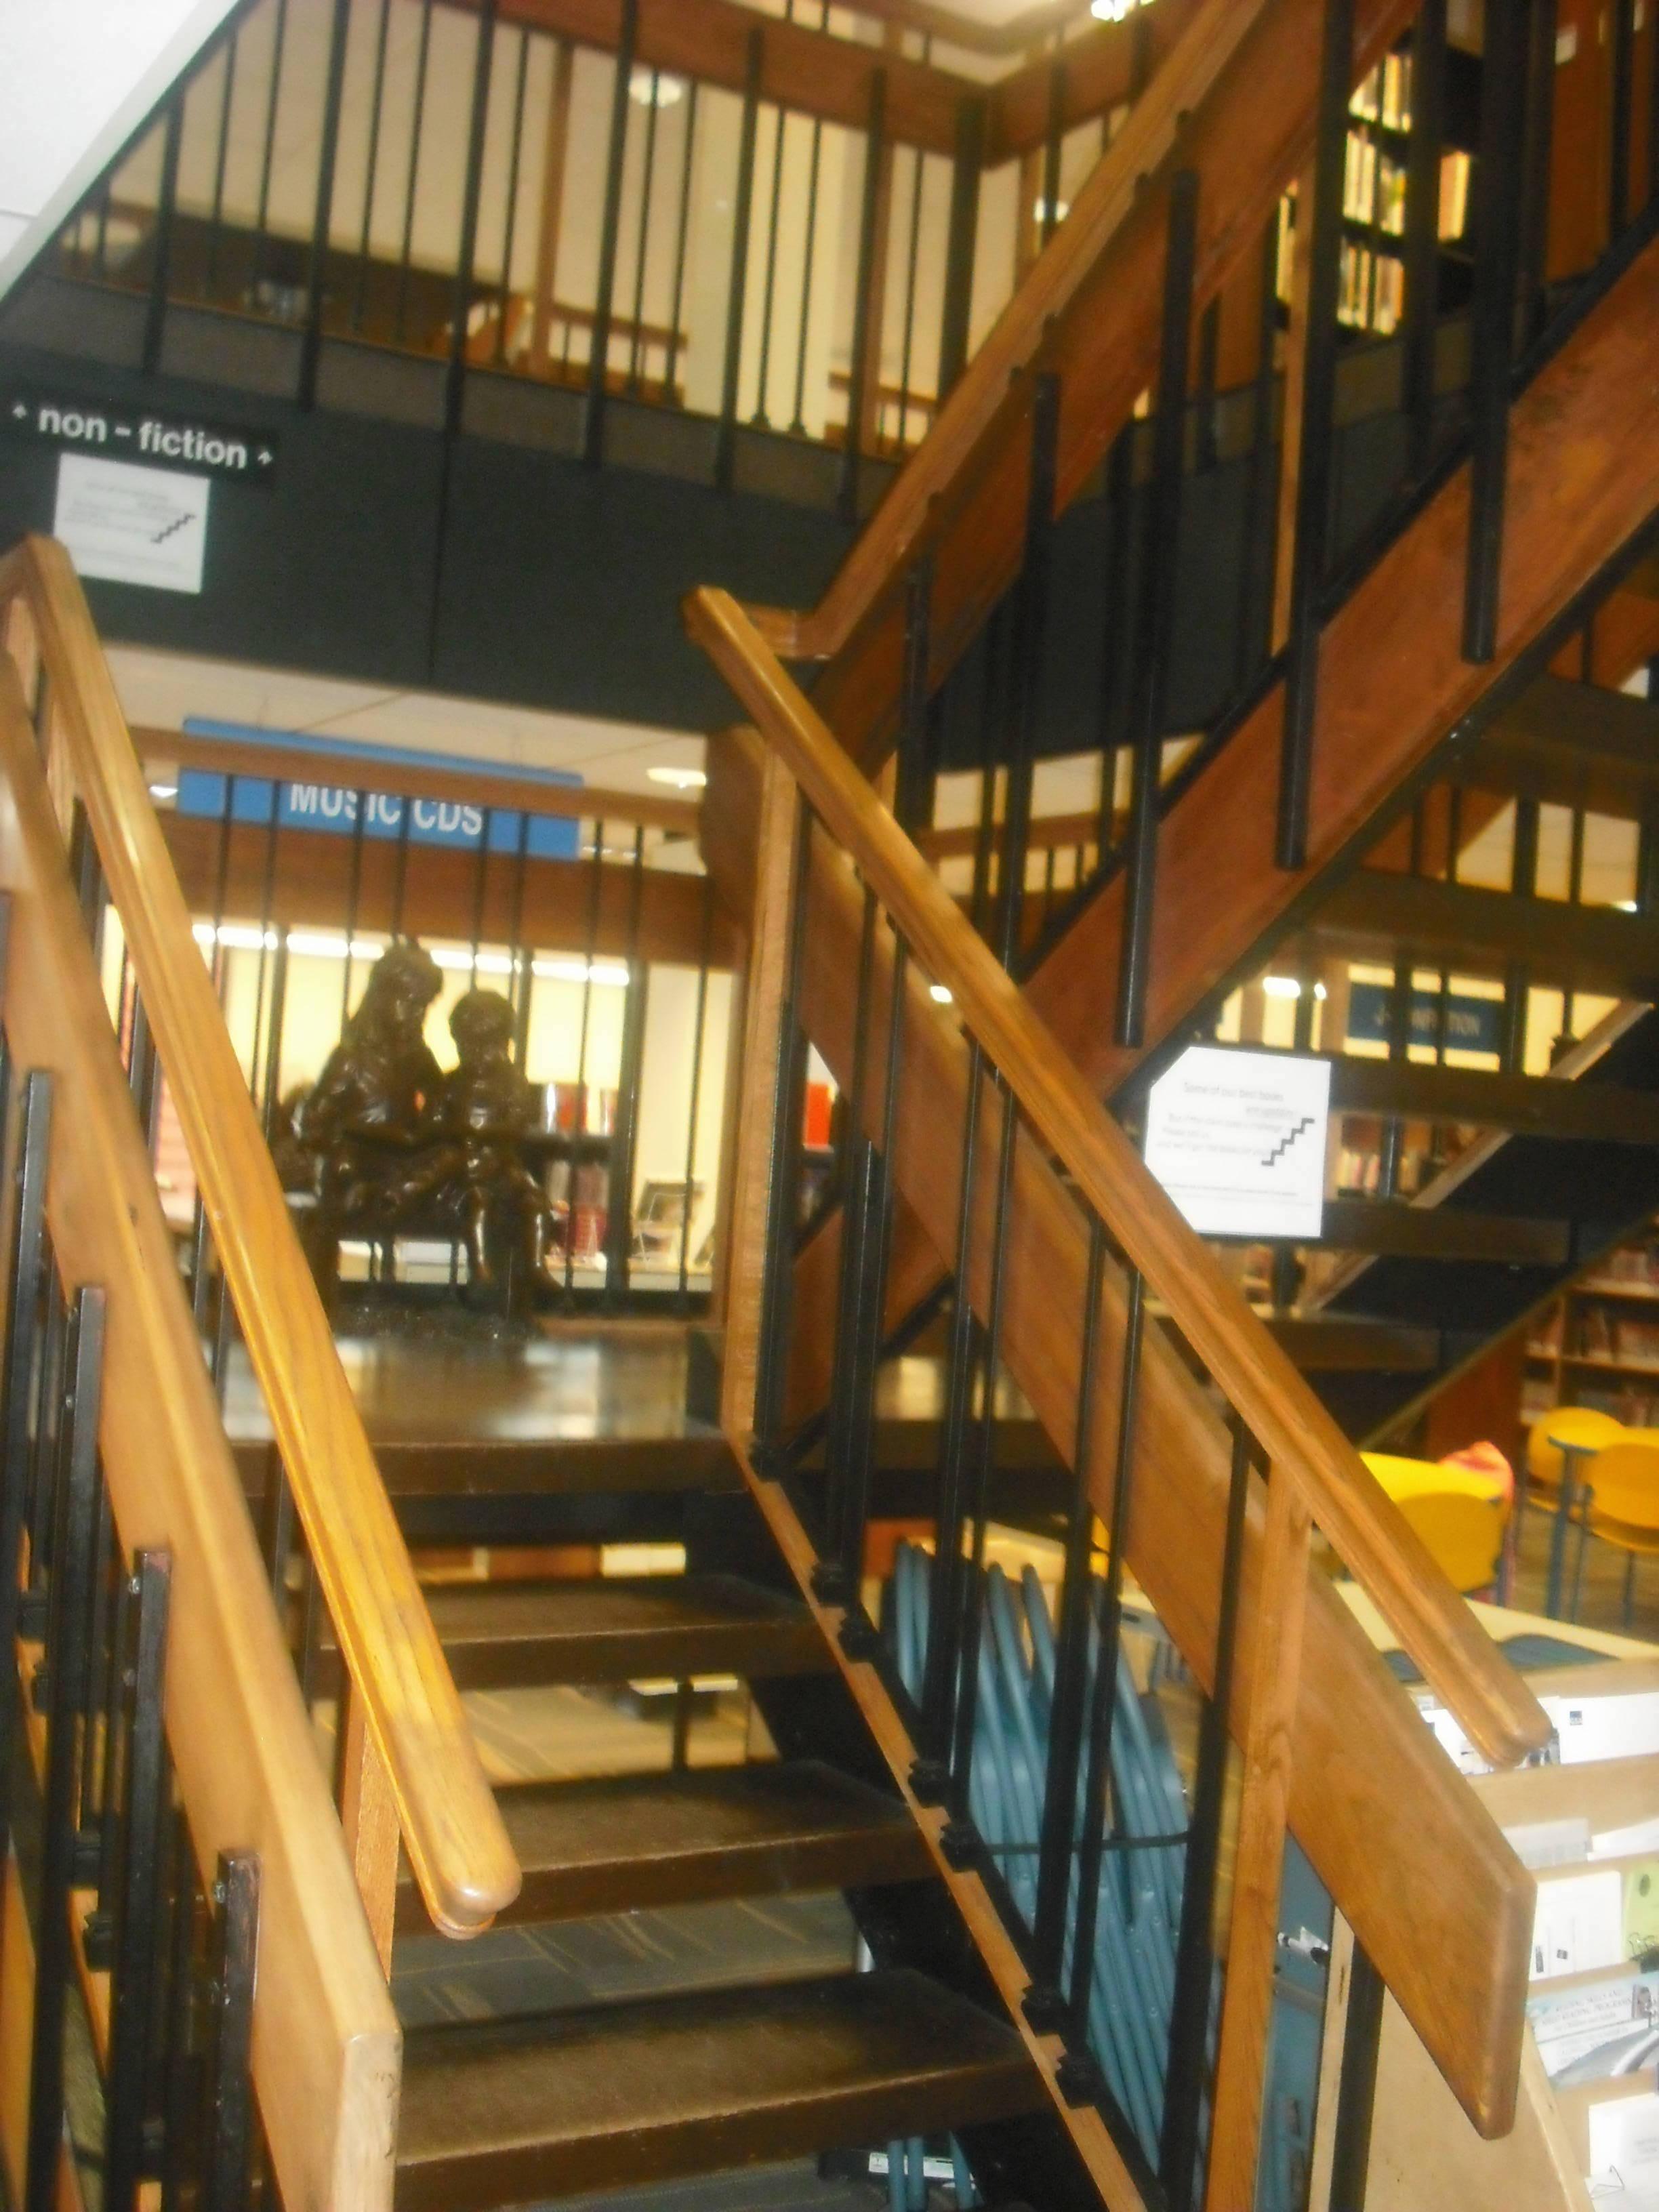 413132e5a665aaa5aa65_stairslfpl.jpeg